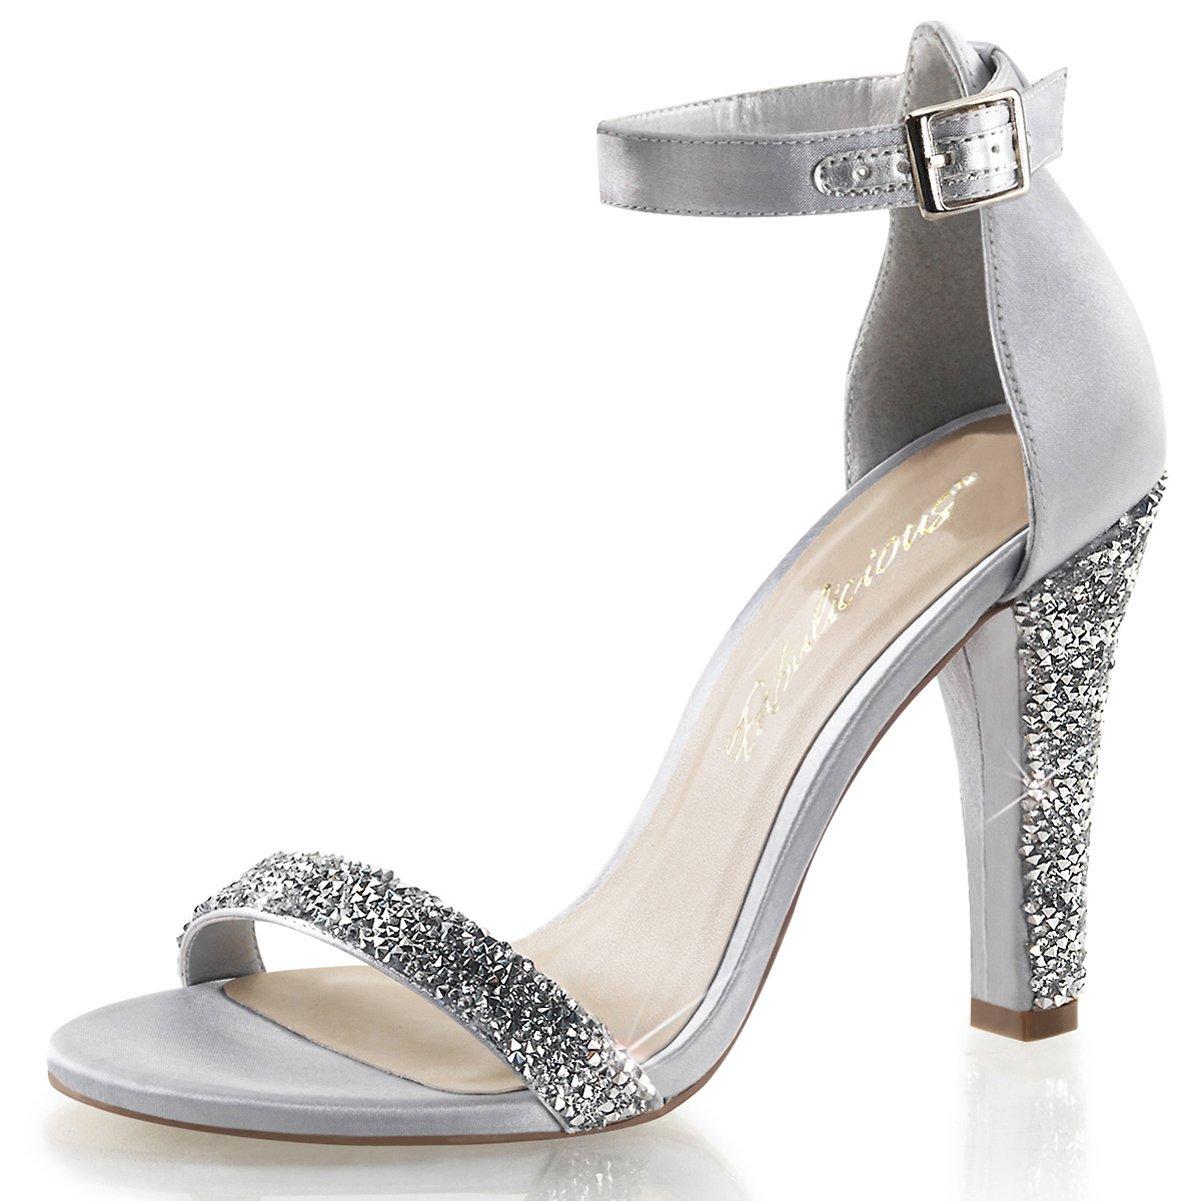 72bfa453c35 Summitfashions Womens Rhinestone Bridal Shoes Ankle Strap Sandals Closed  Back 4 1/2 Inch Heels